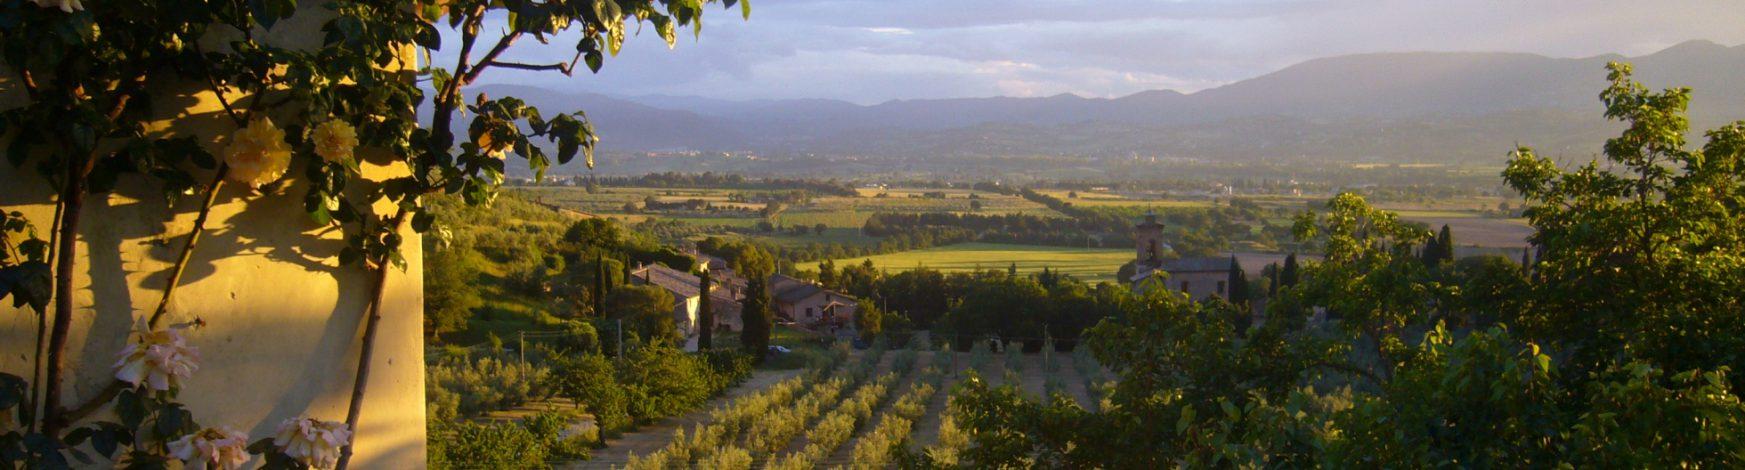 veduta-valle-spoletana